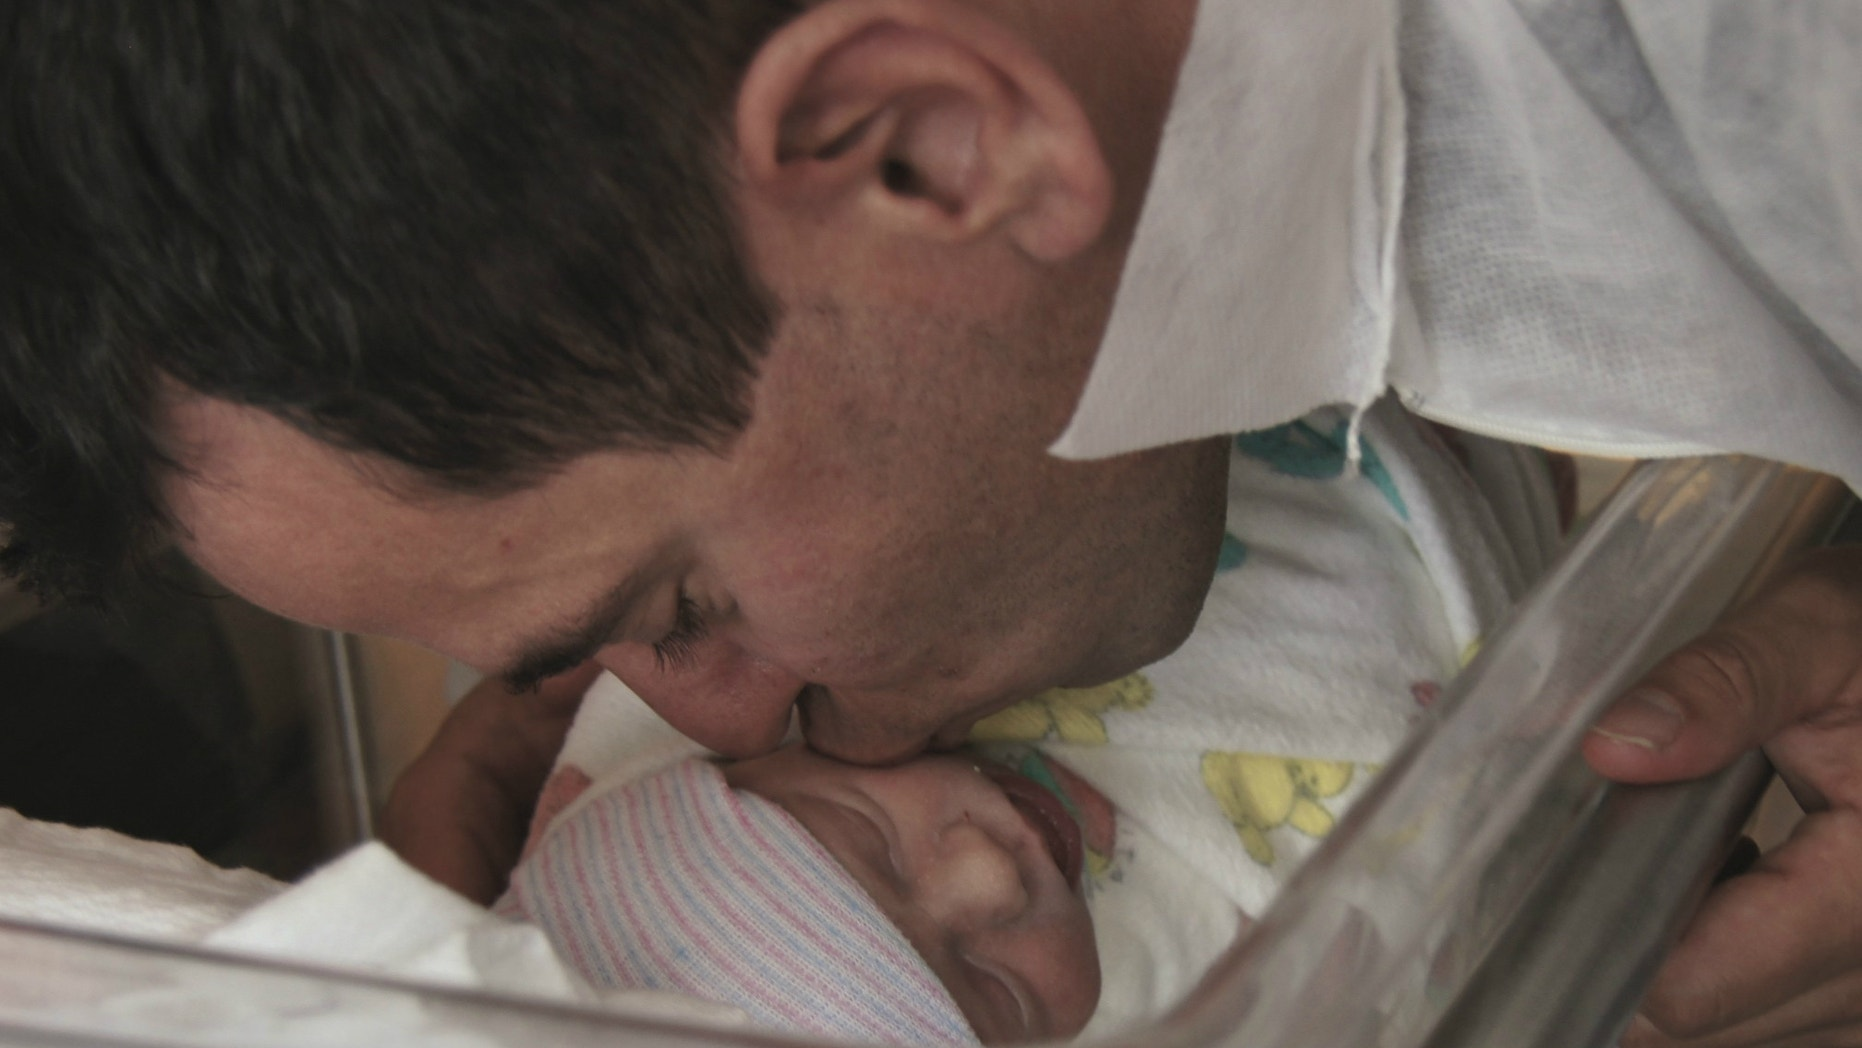 Brian Lande and his newborn son.